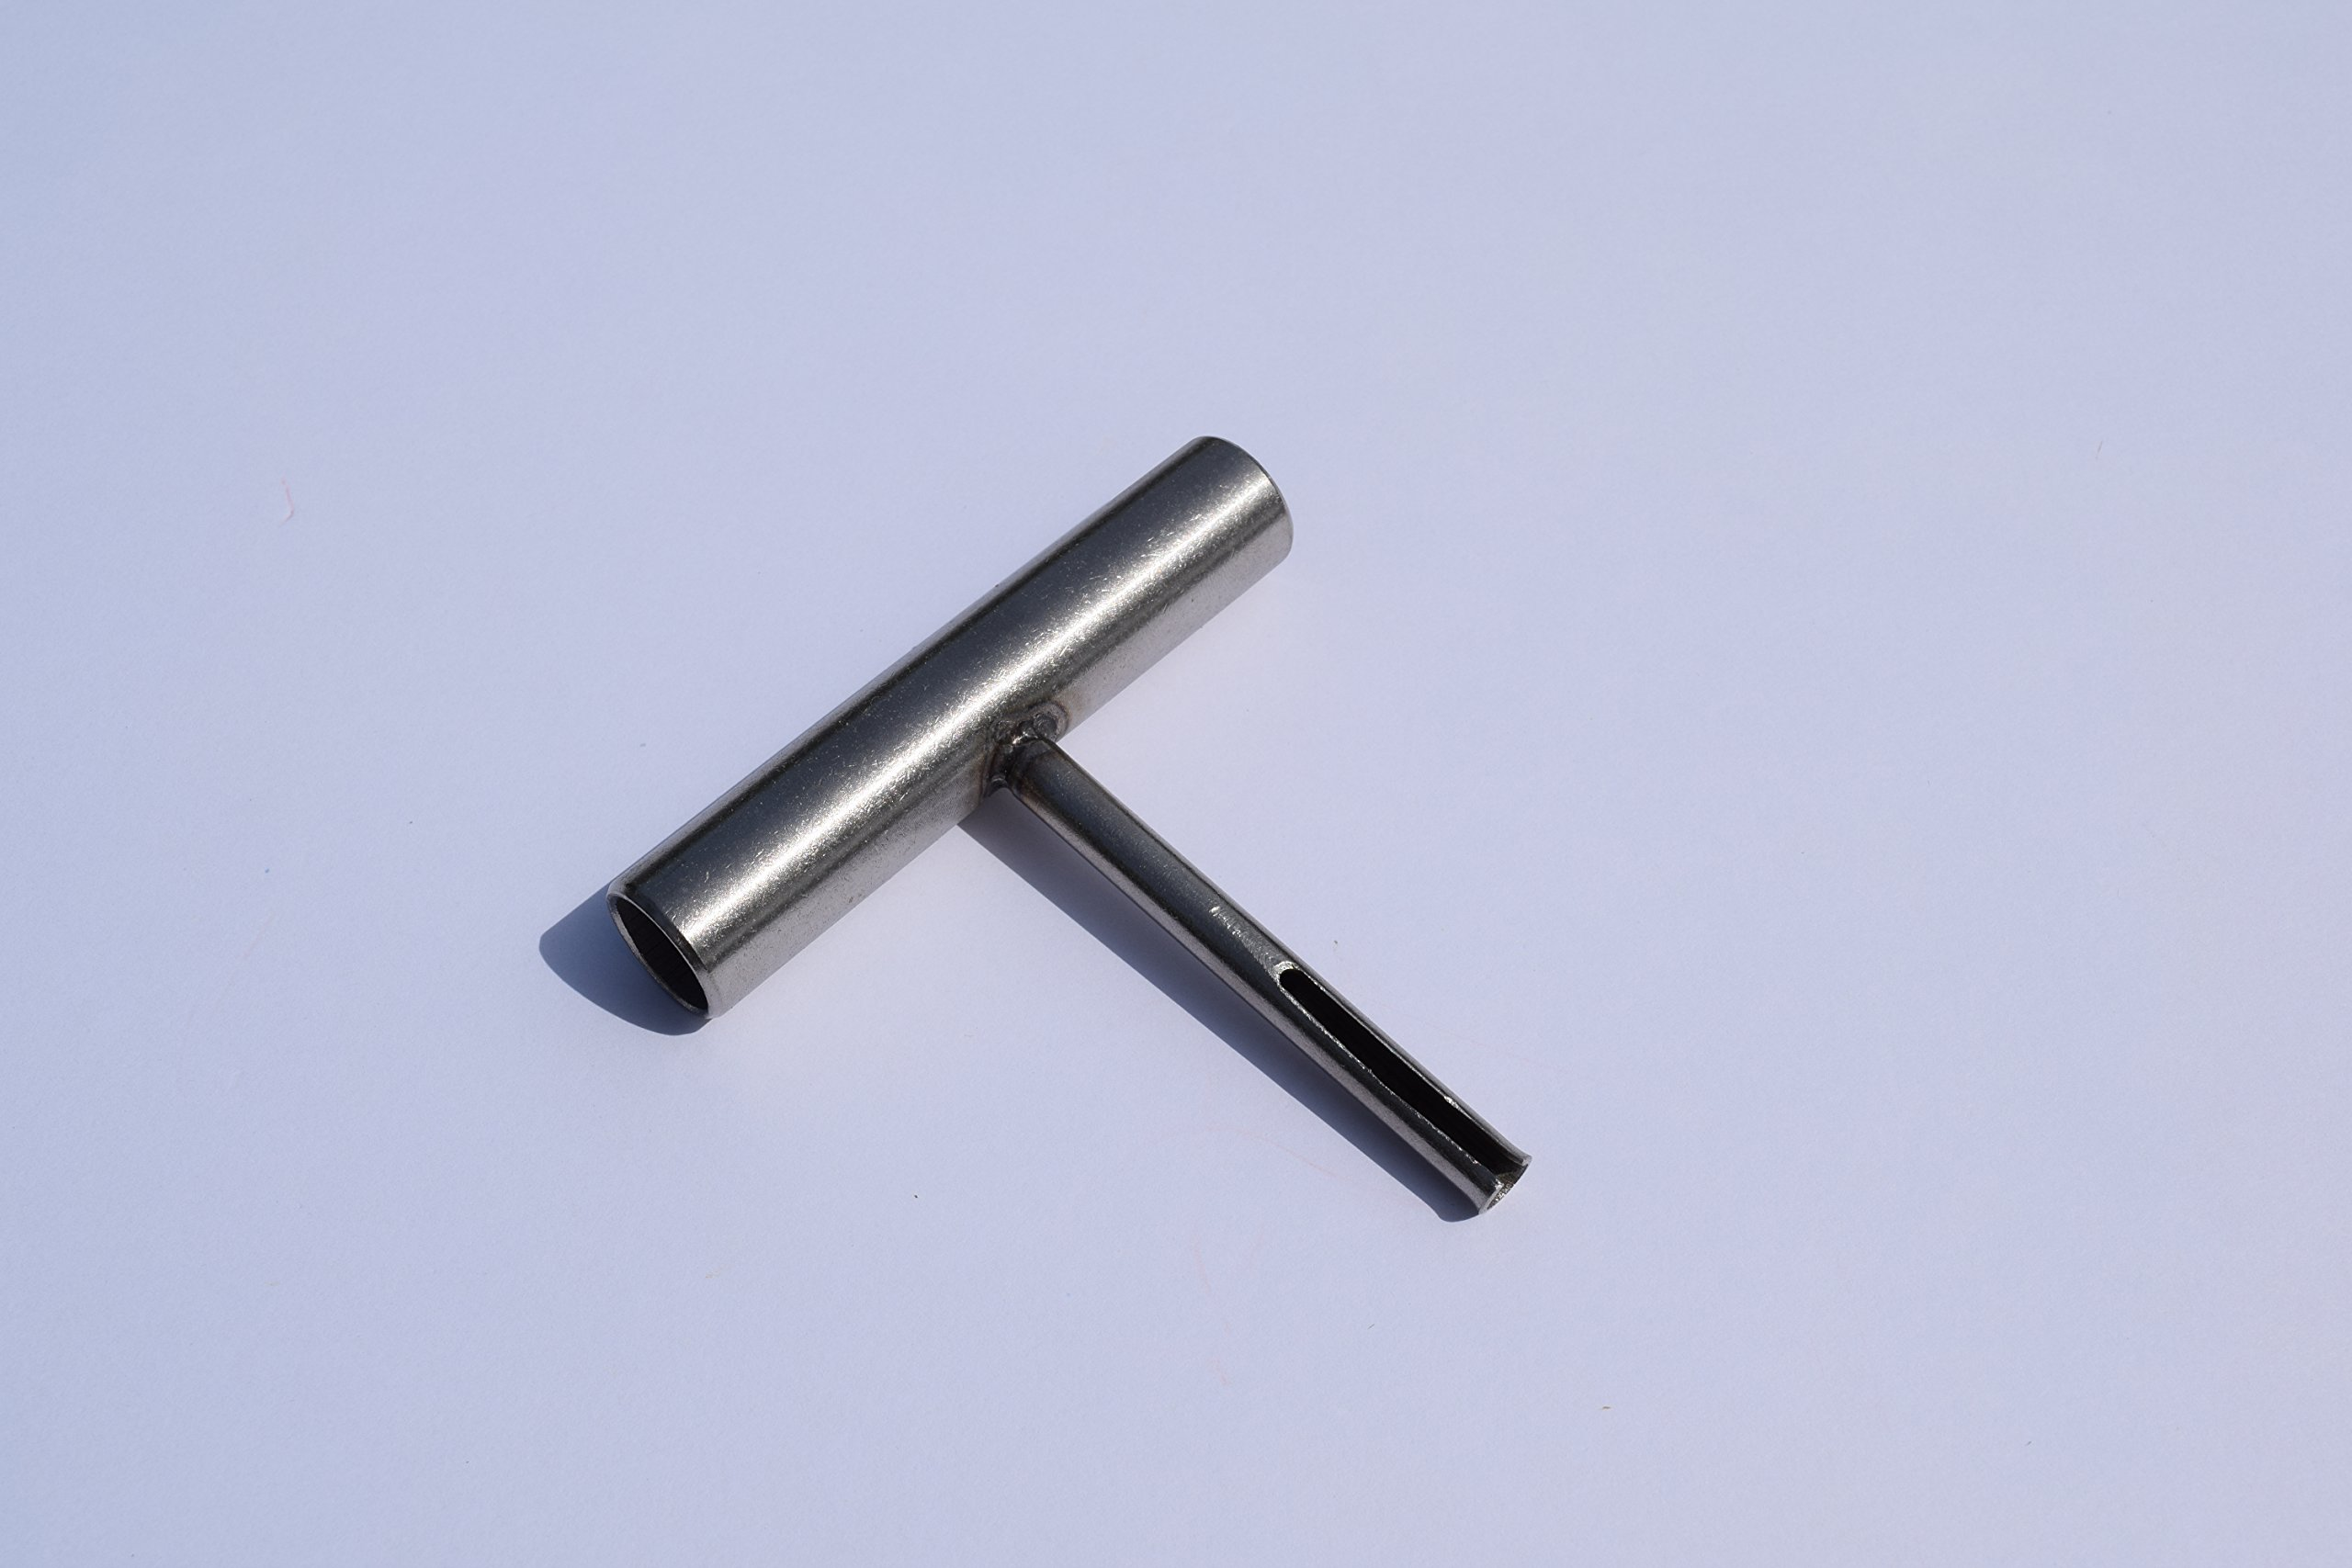 OnBoard Bandit Tbar Spear Band Wishbone Insertion Tool